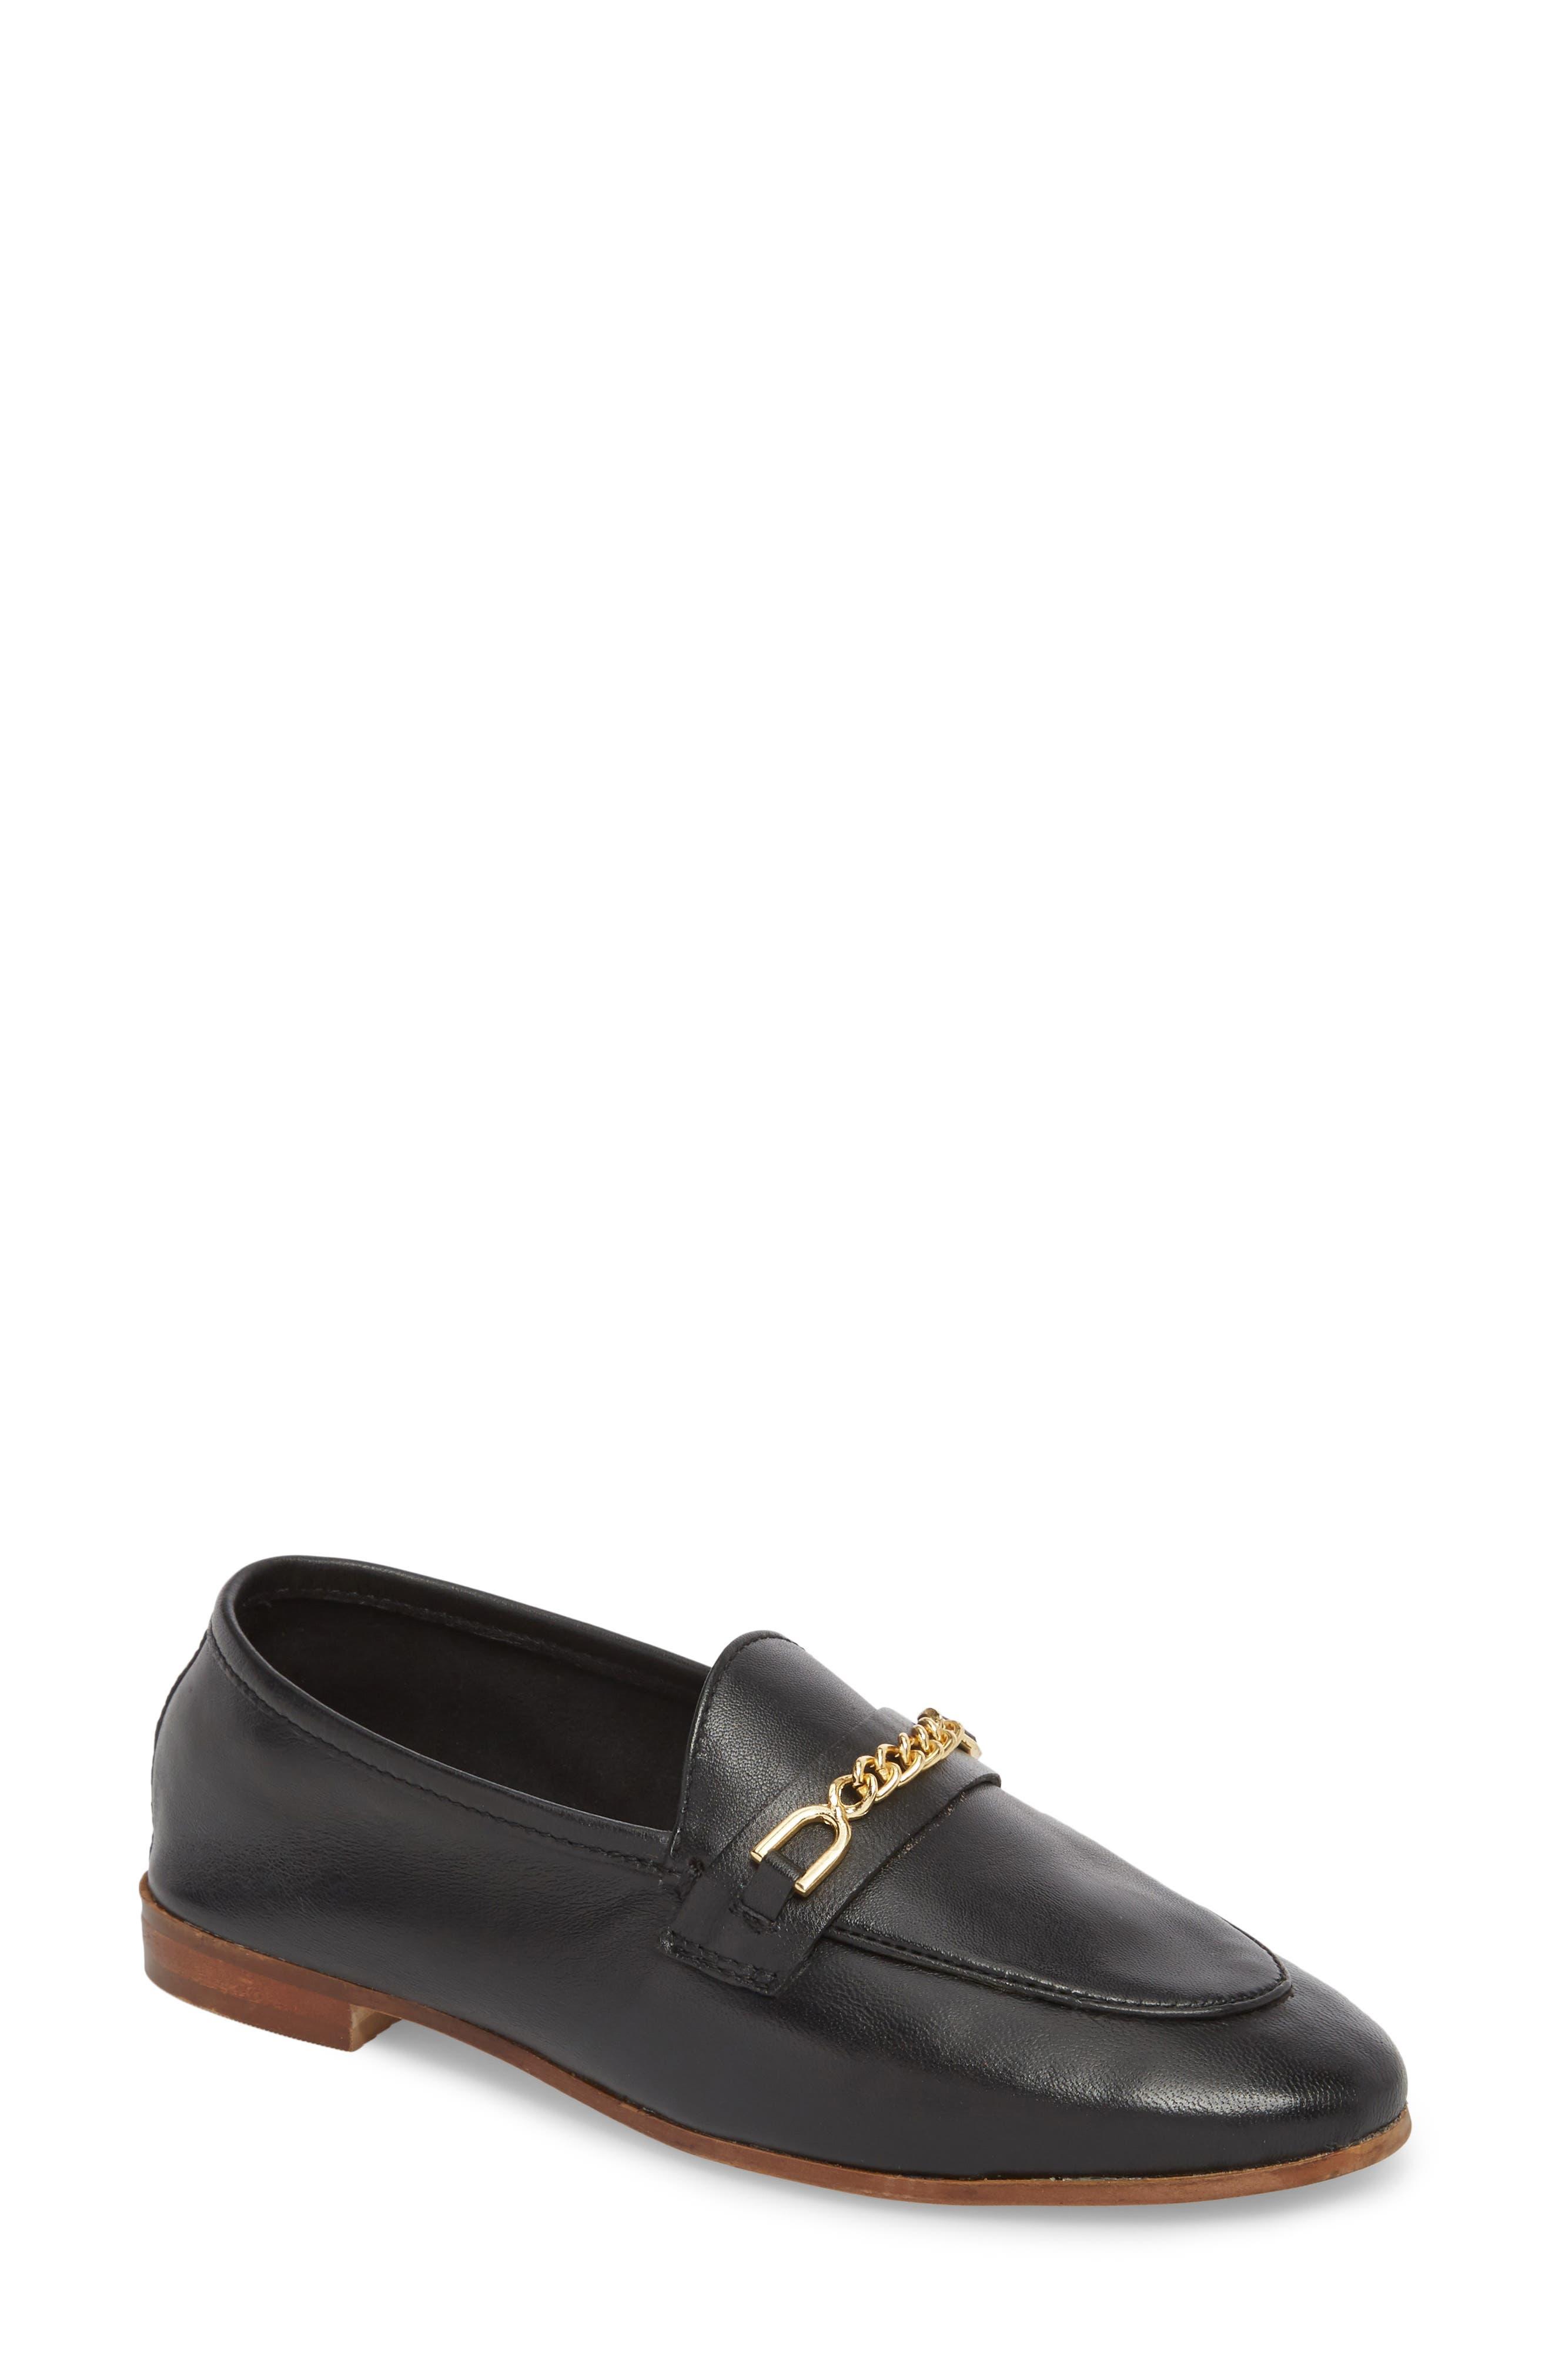 Chain Trim Apron Toe Loafer,                         Main,                         color, Black